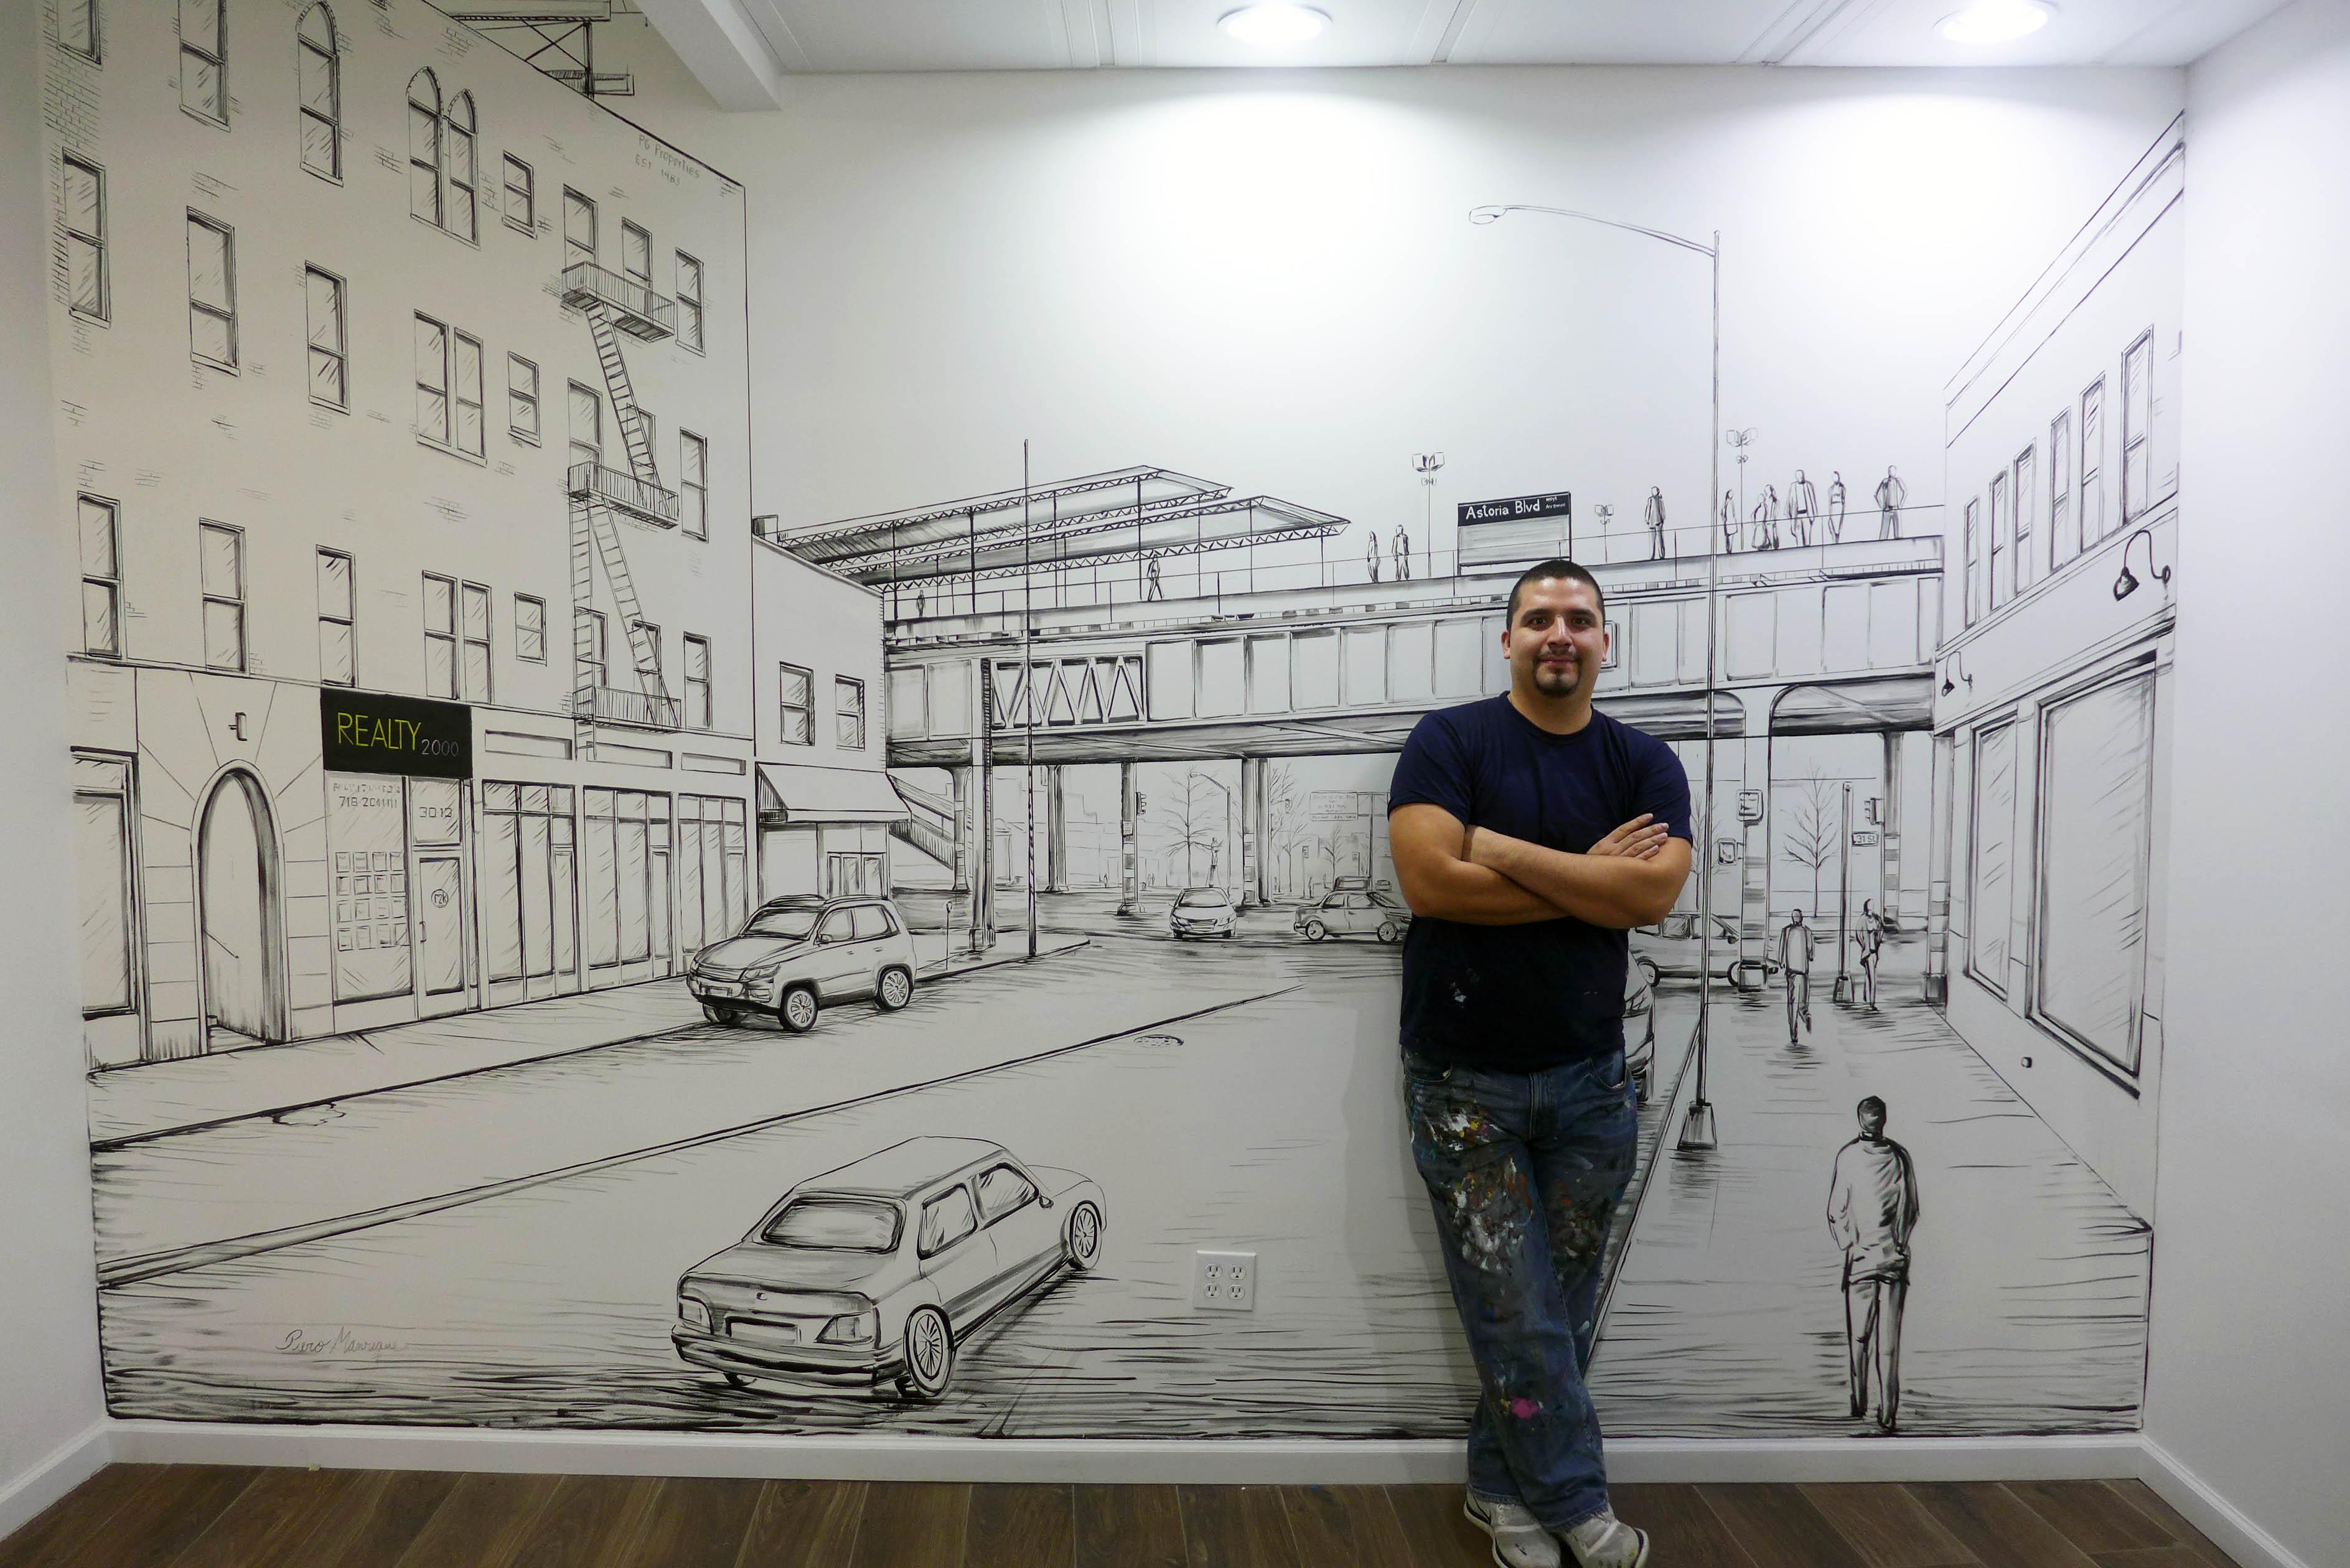 Piero Manrique in front of his mural